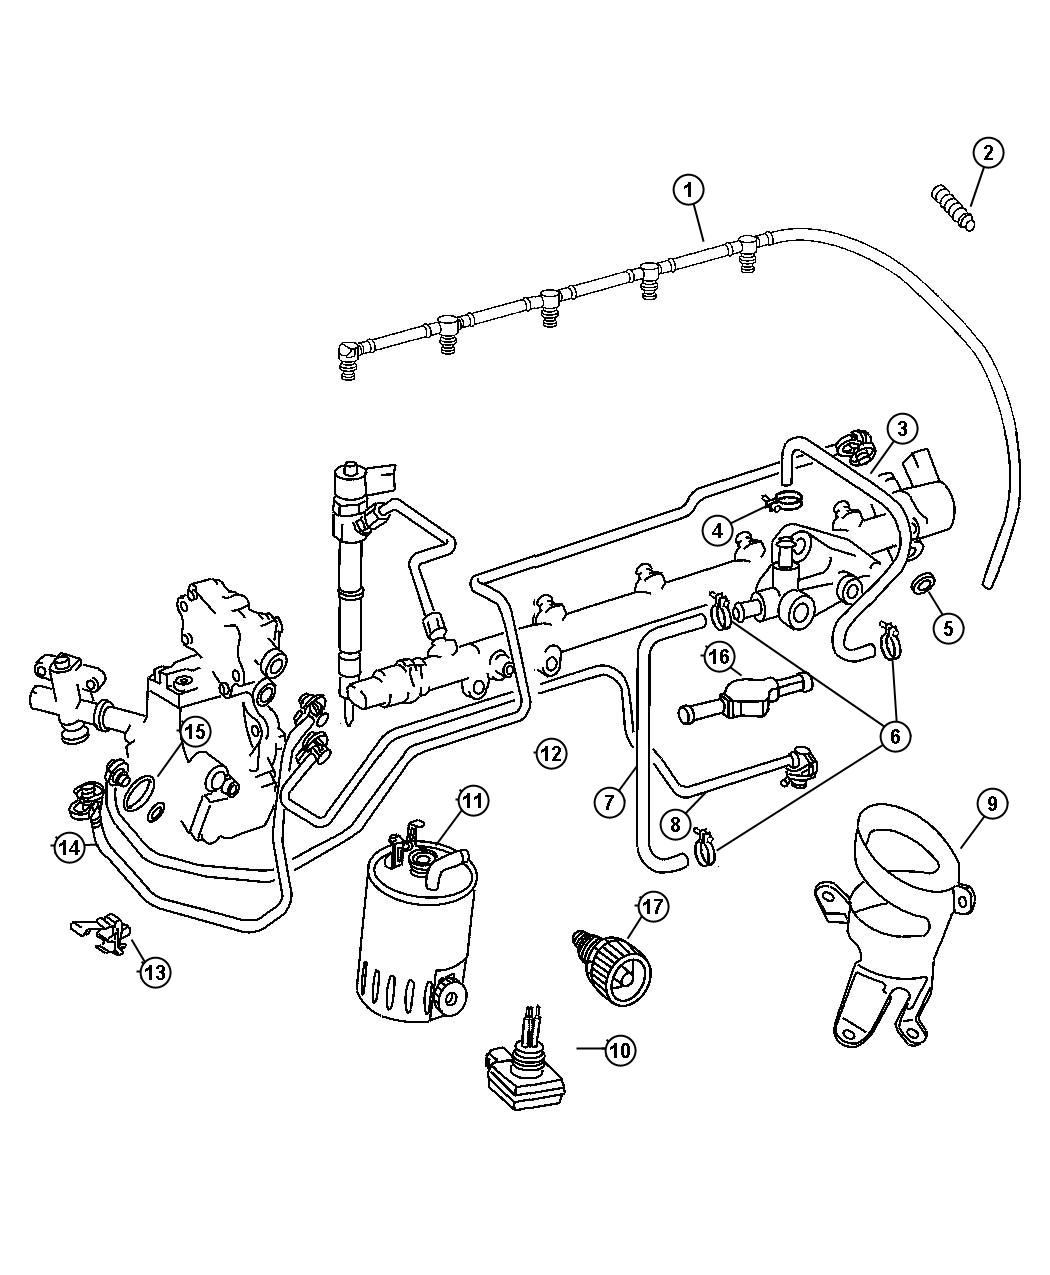 tags: #2004 f150 pcv valve location#toyota camry fuel filter location#2003  expedition fuel filter location#2000 ford taurus fuel pump relay#honda  accord